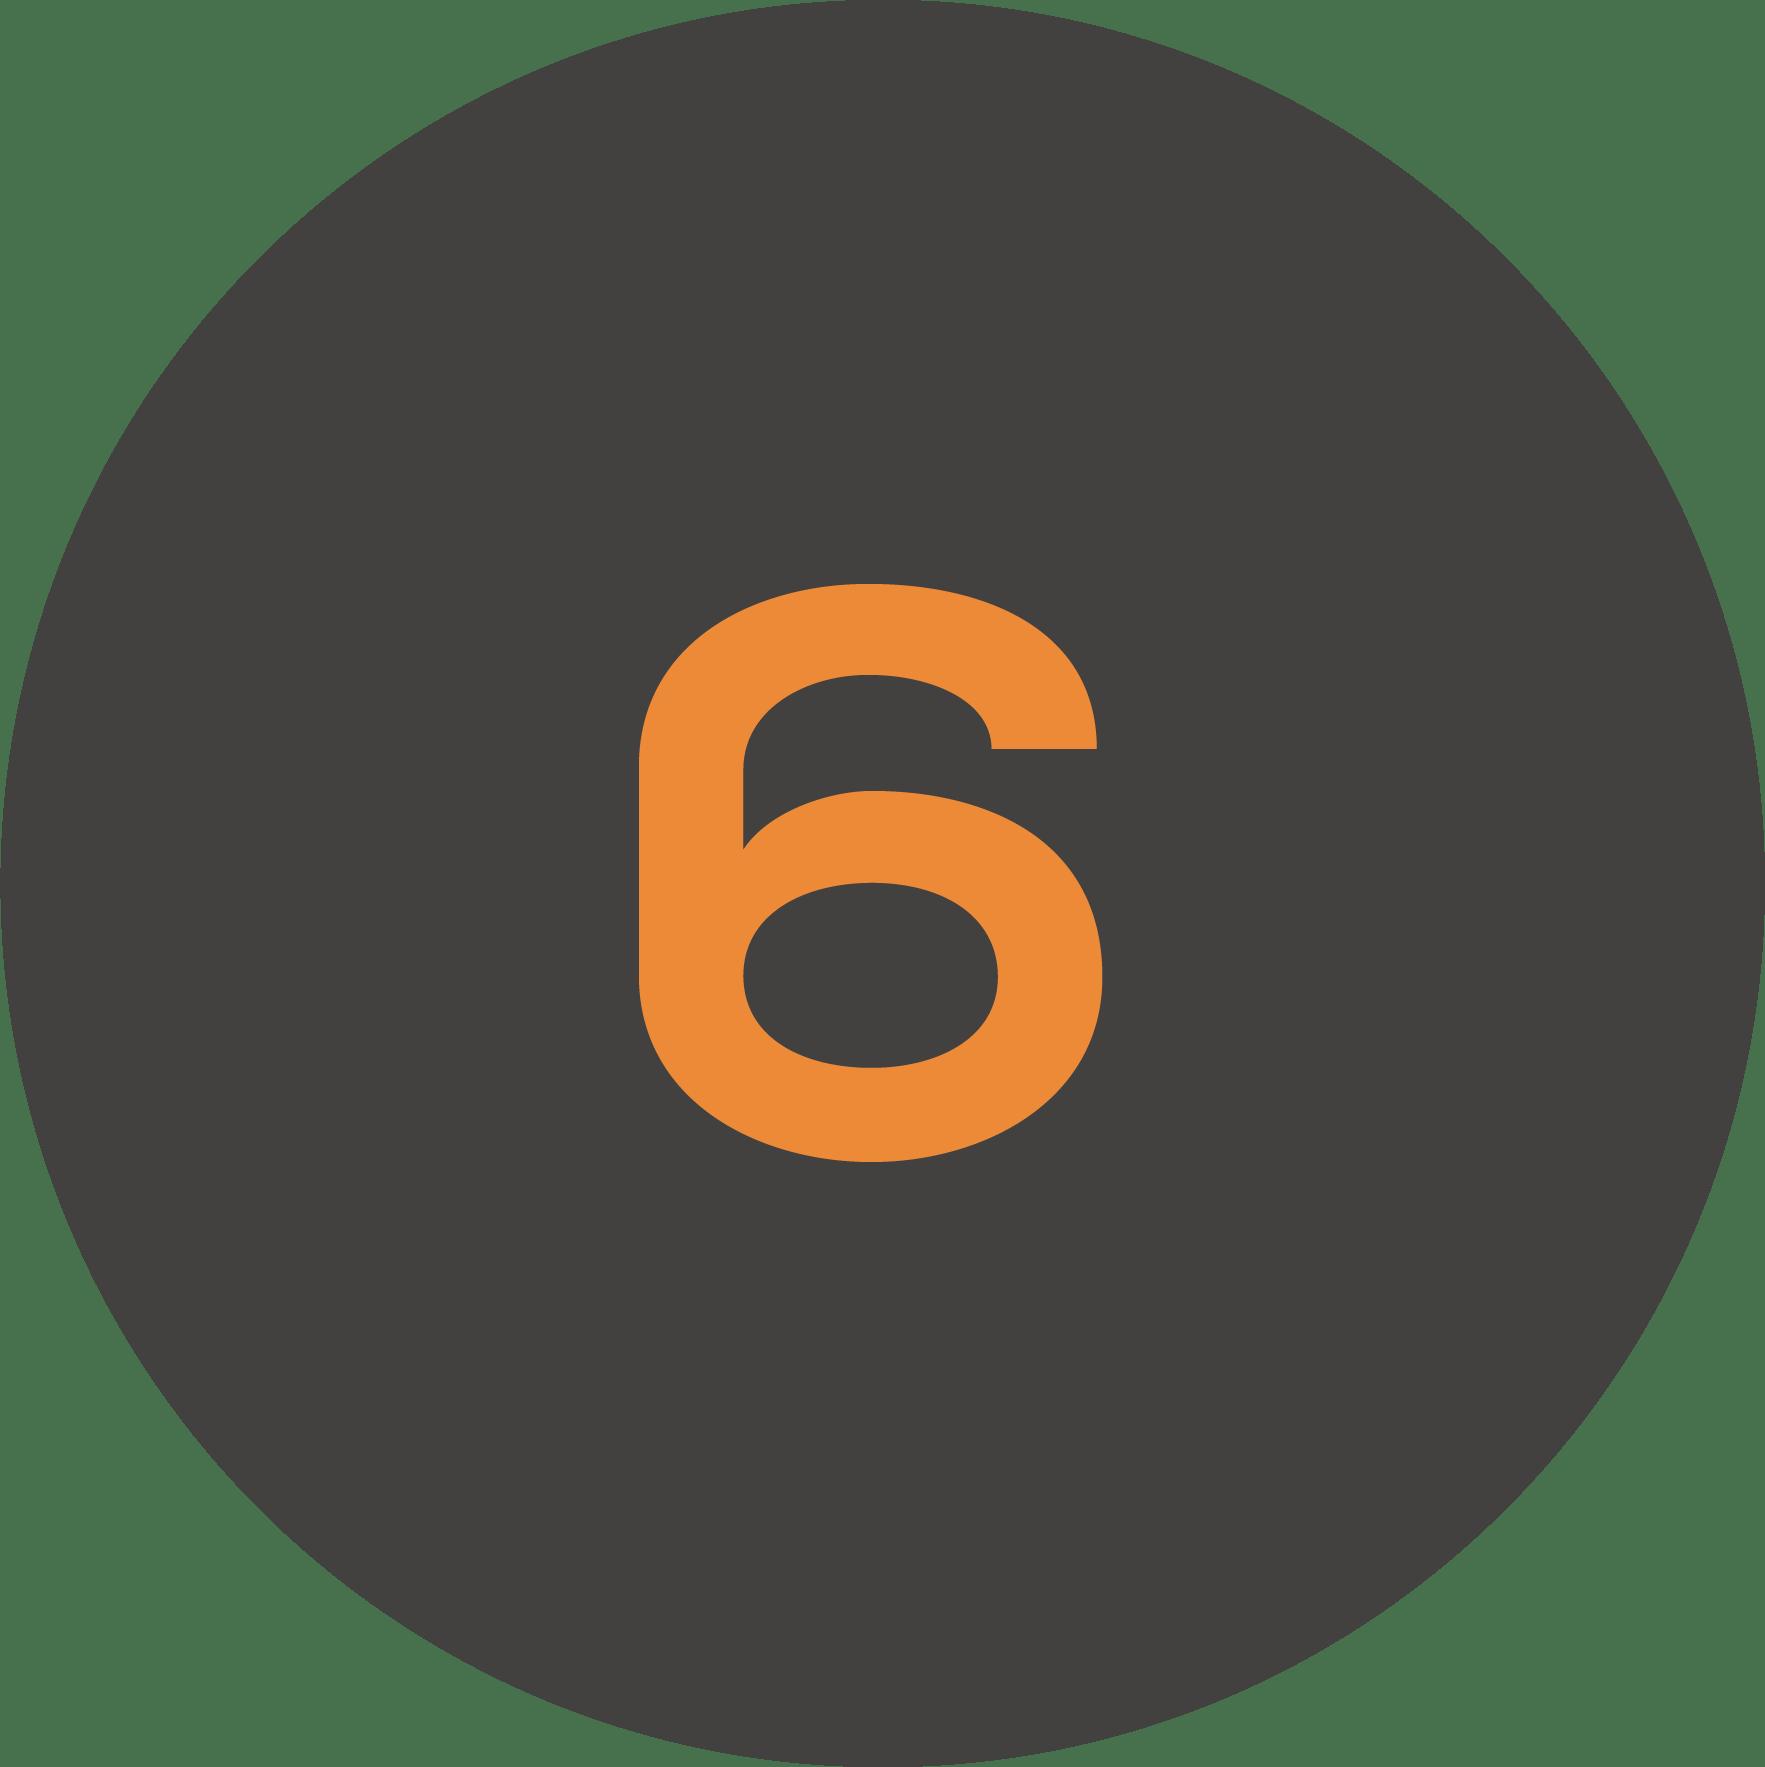 6-img